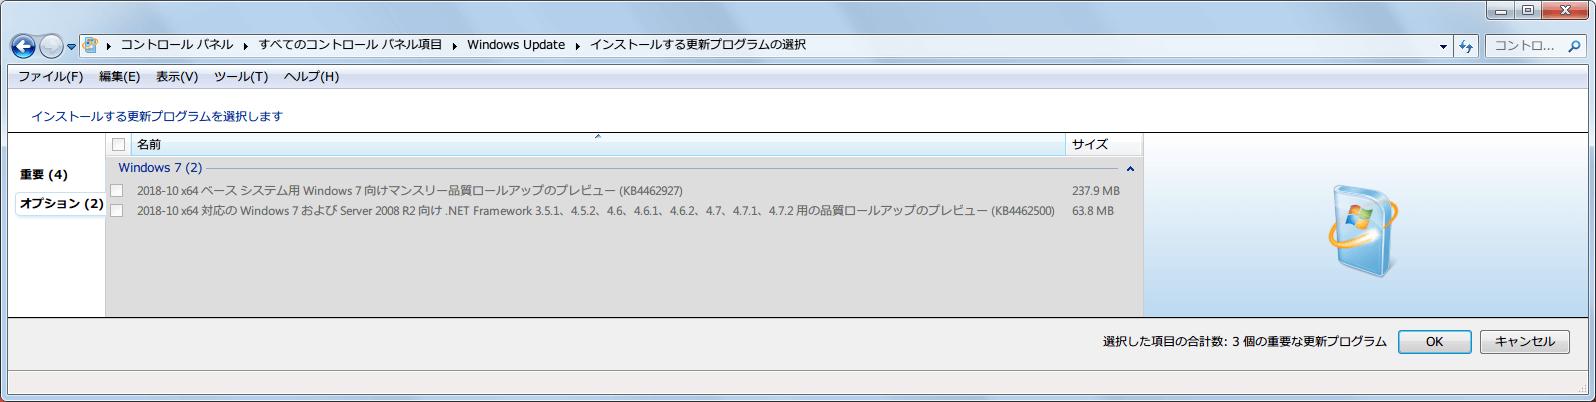 Windows 7 64bit Windows Update オプション 2018年10月分リスト KB4462927 KB4462500 非表示